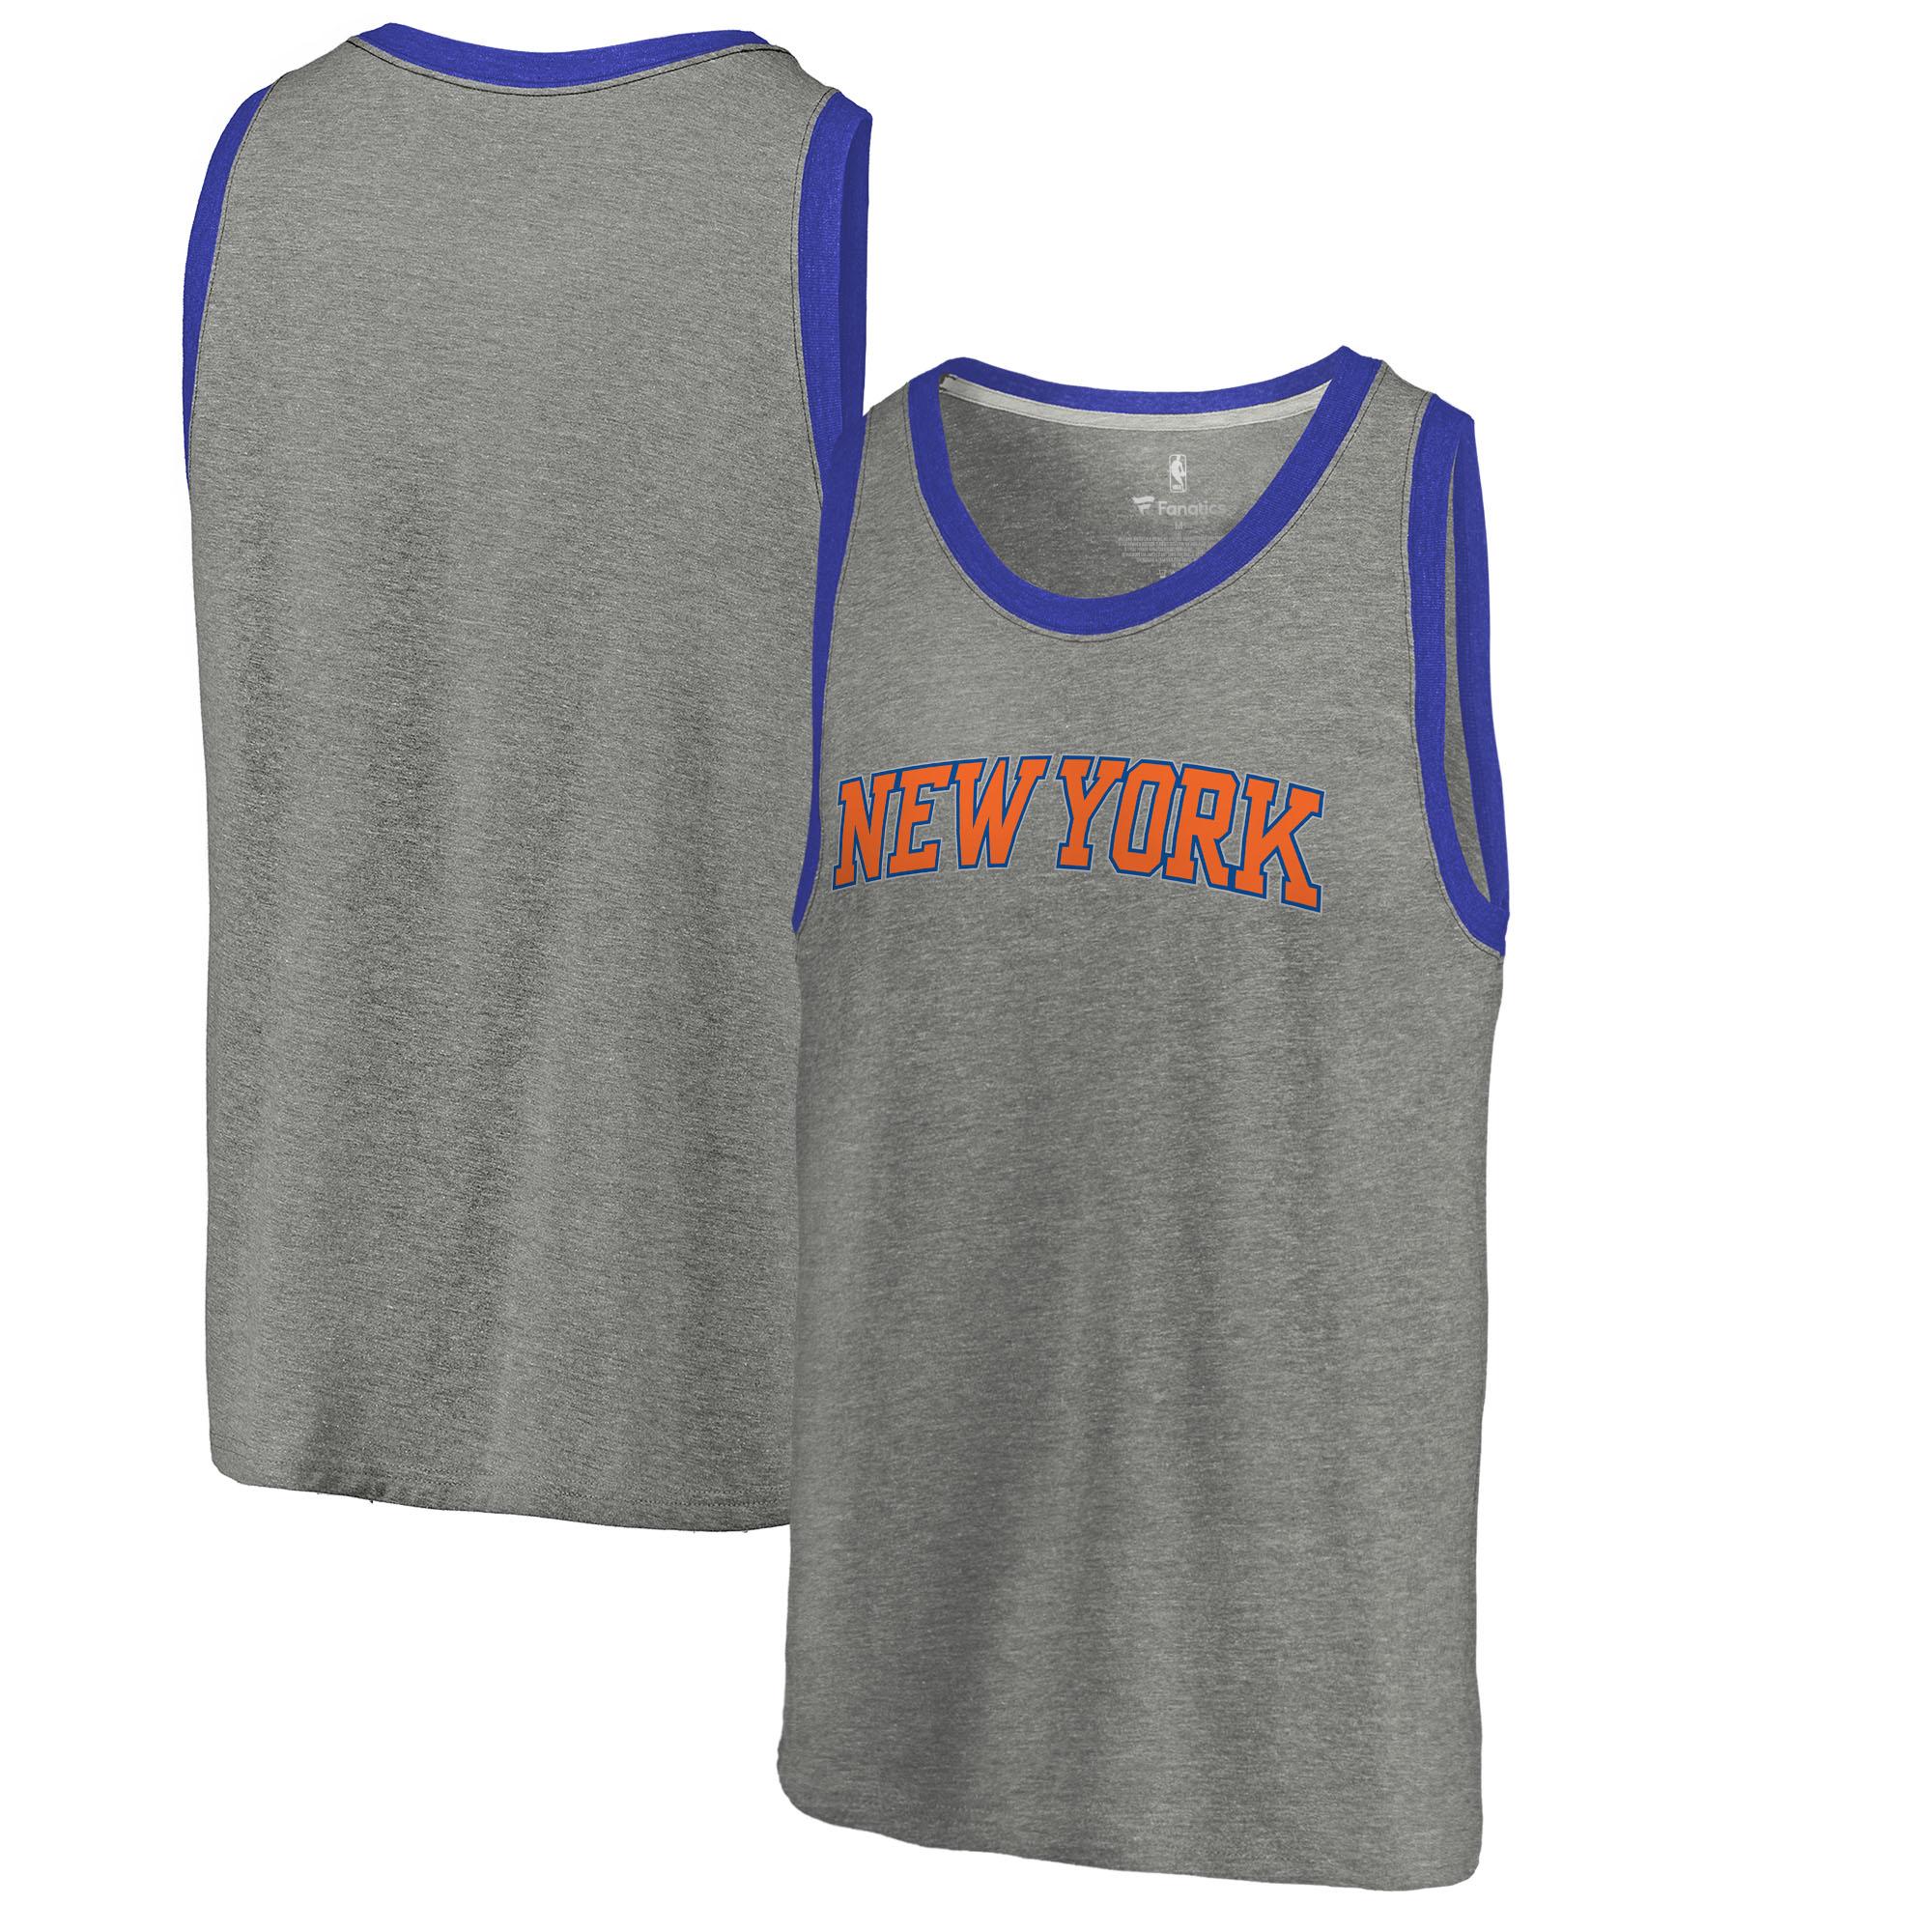 New York Knicks Fanatics Branded Wordmark Tri-Blend Tank Top - Heathered Gray